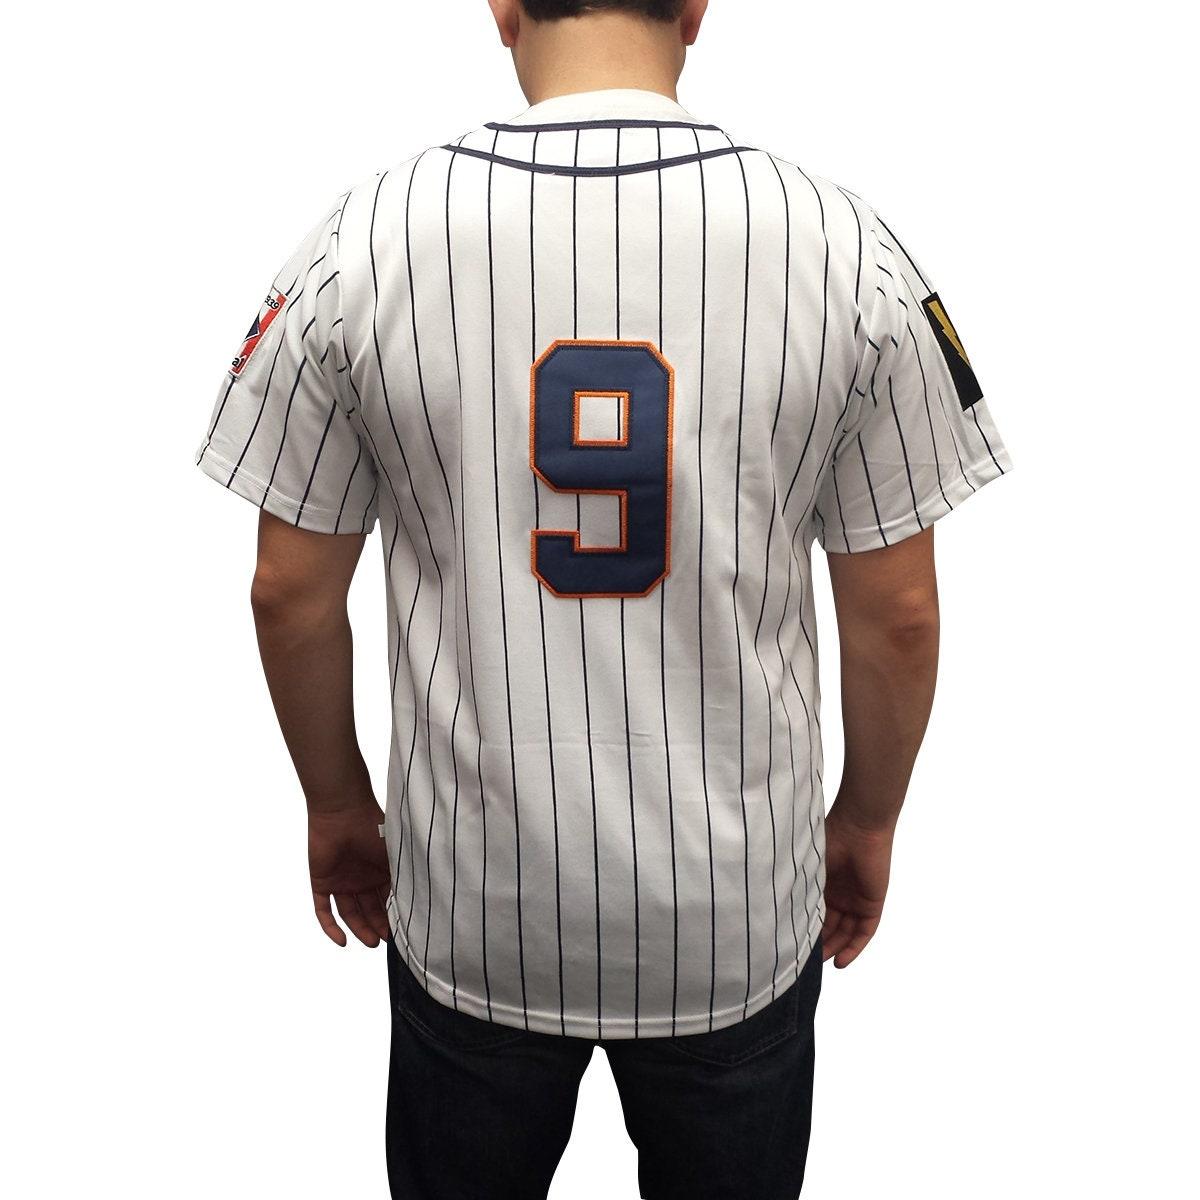 614da78b Roy Hobbs #9 Knights Baseball Jersey New York NY Costume Movie Shirt Gift  Halloween 80s Uniform